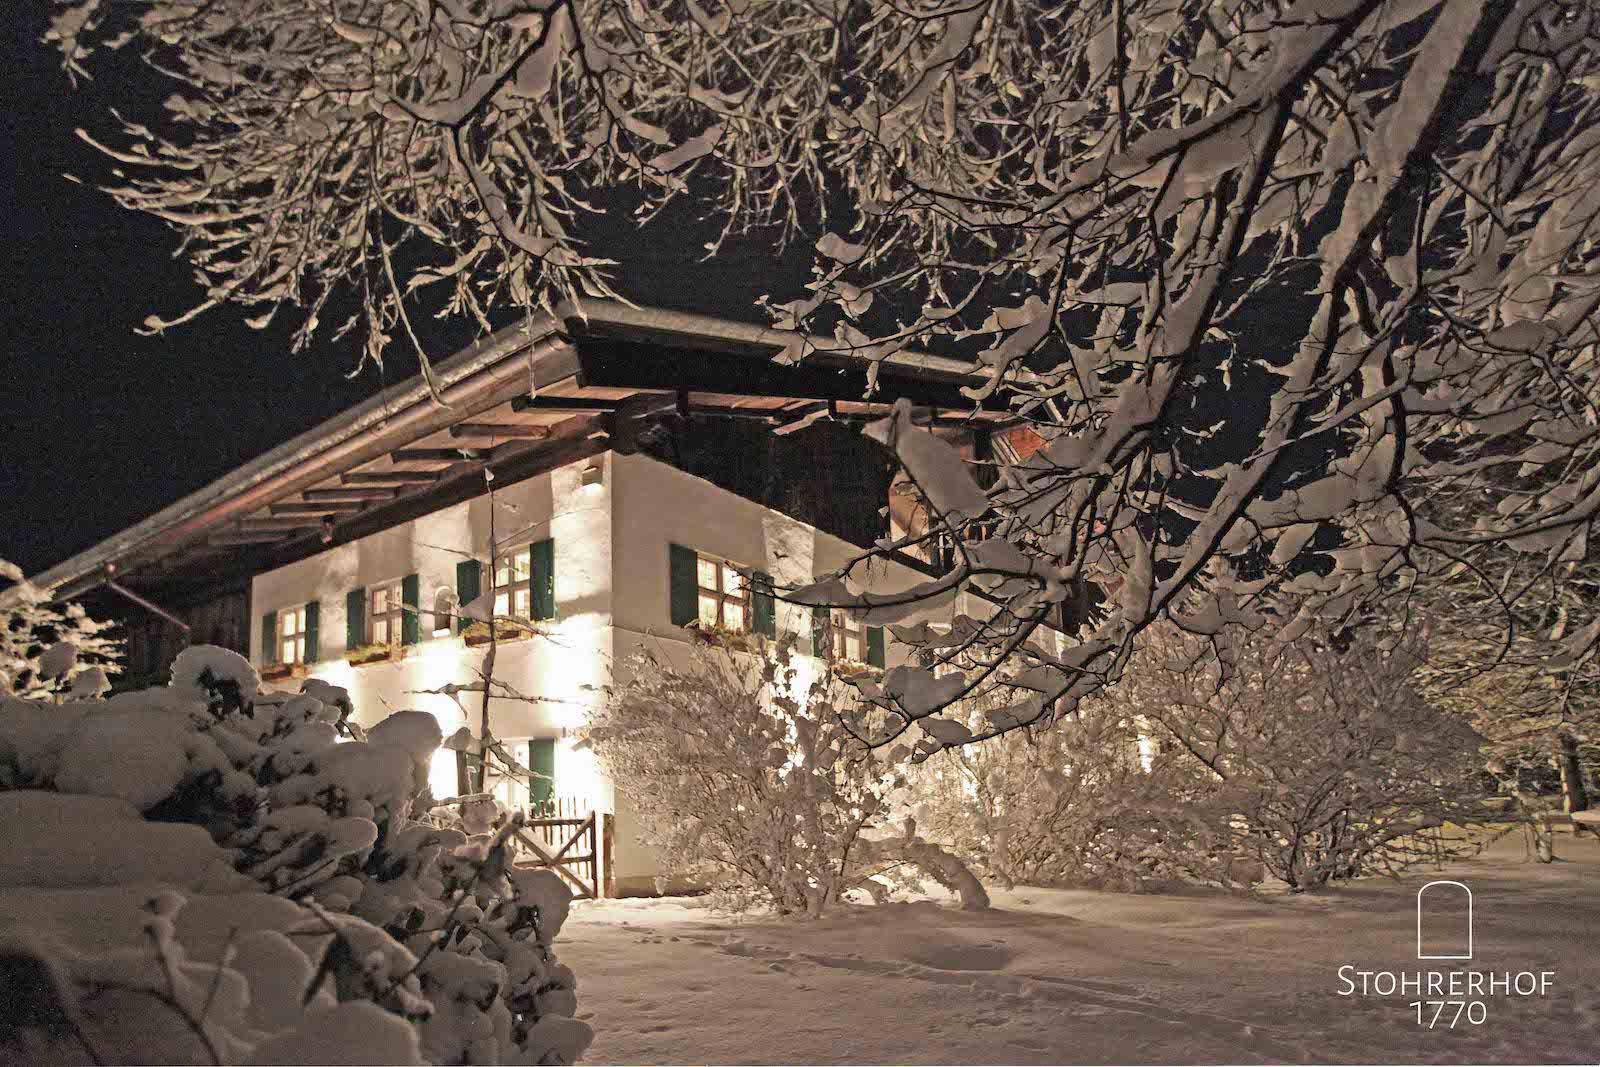 54-Stohrerhof-Winterbild-0-K